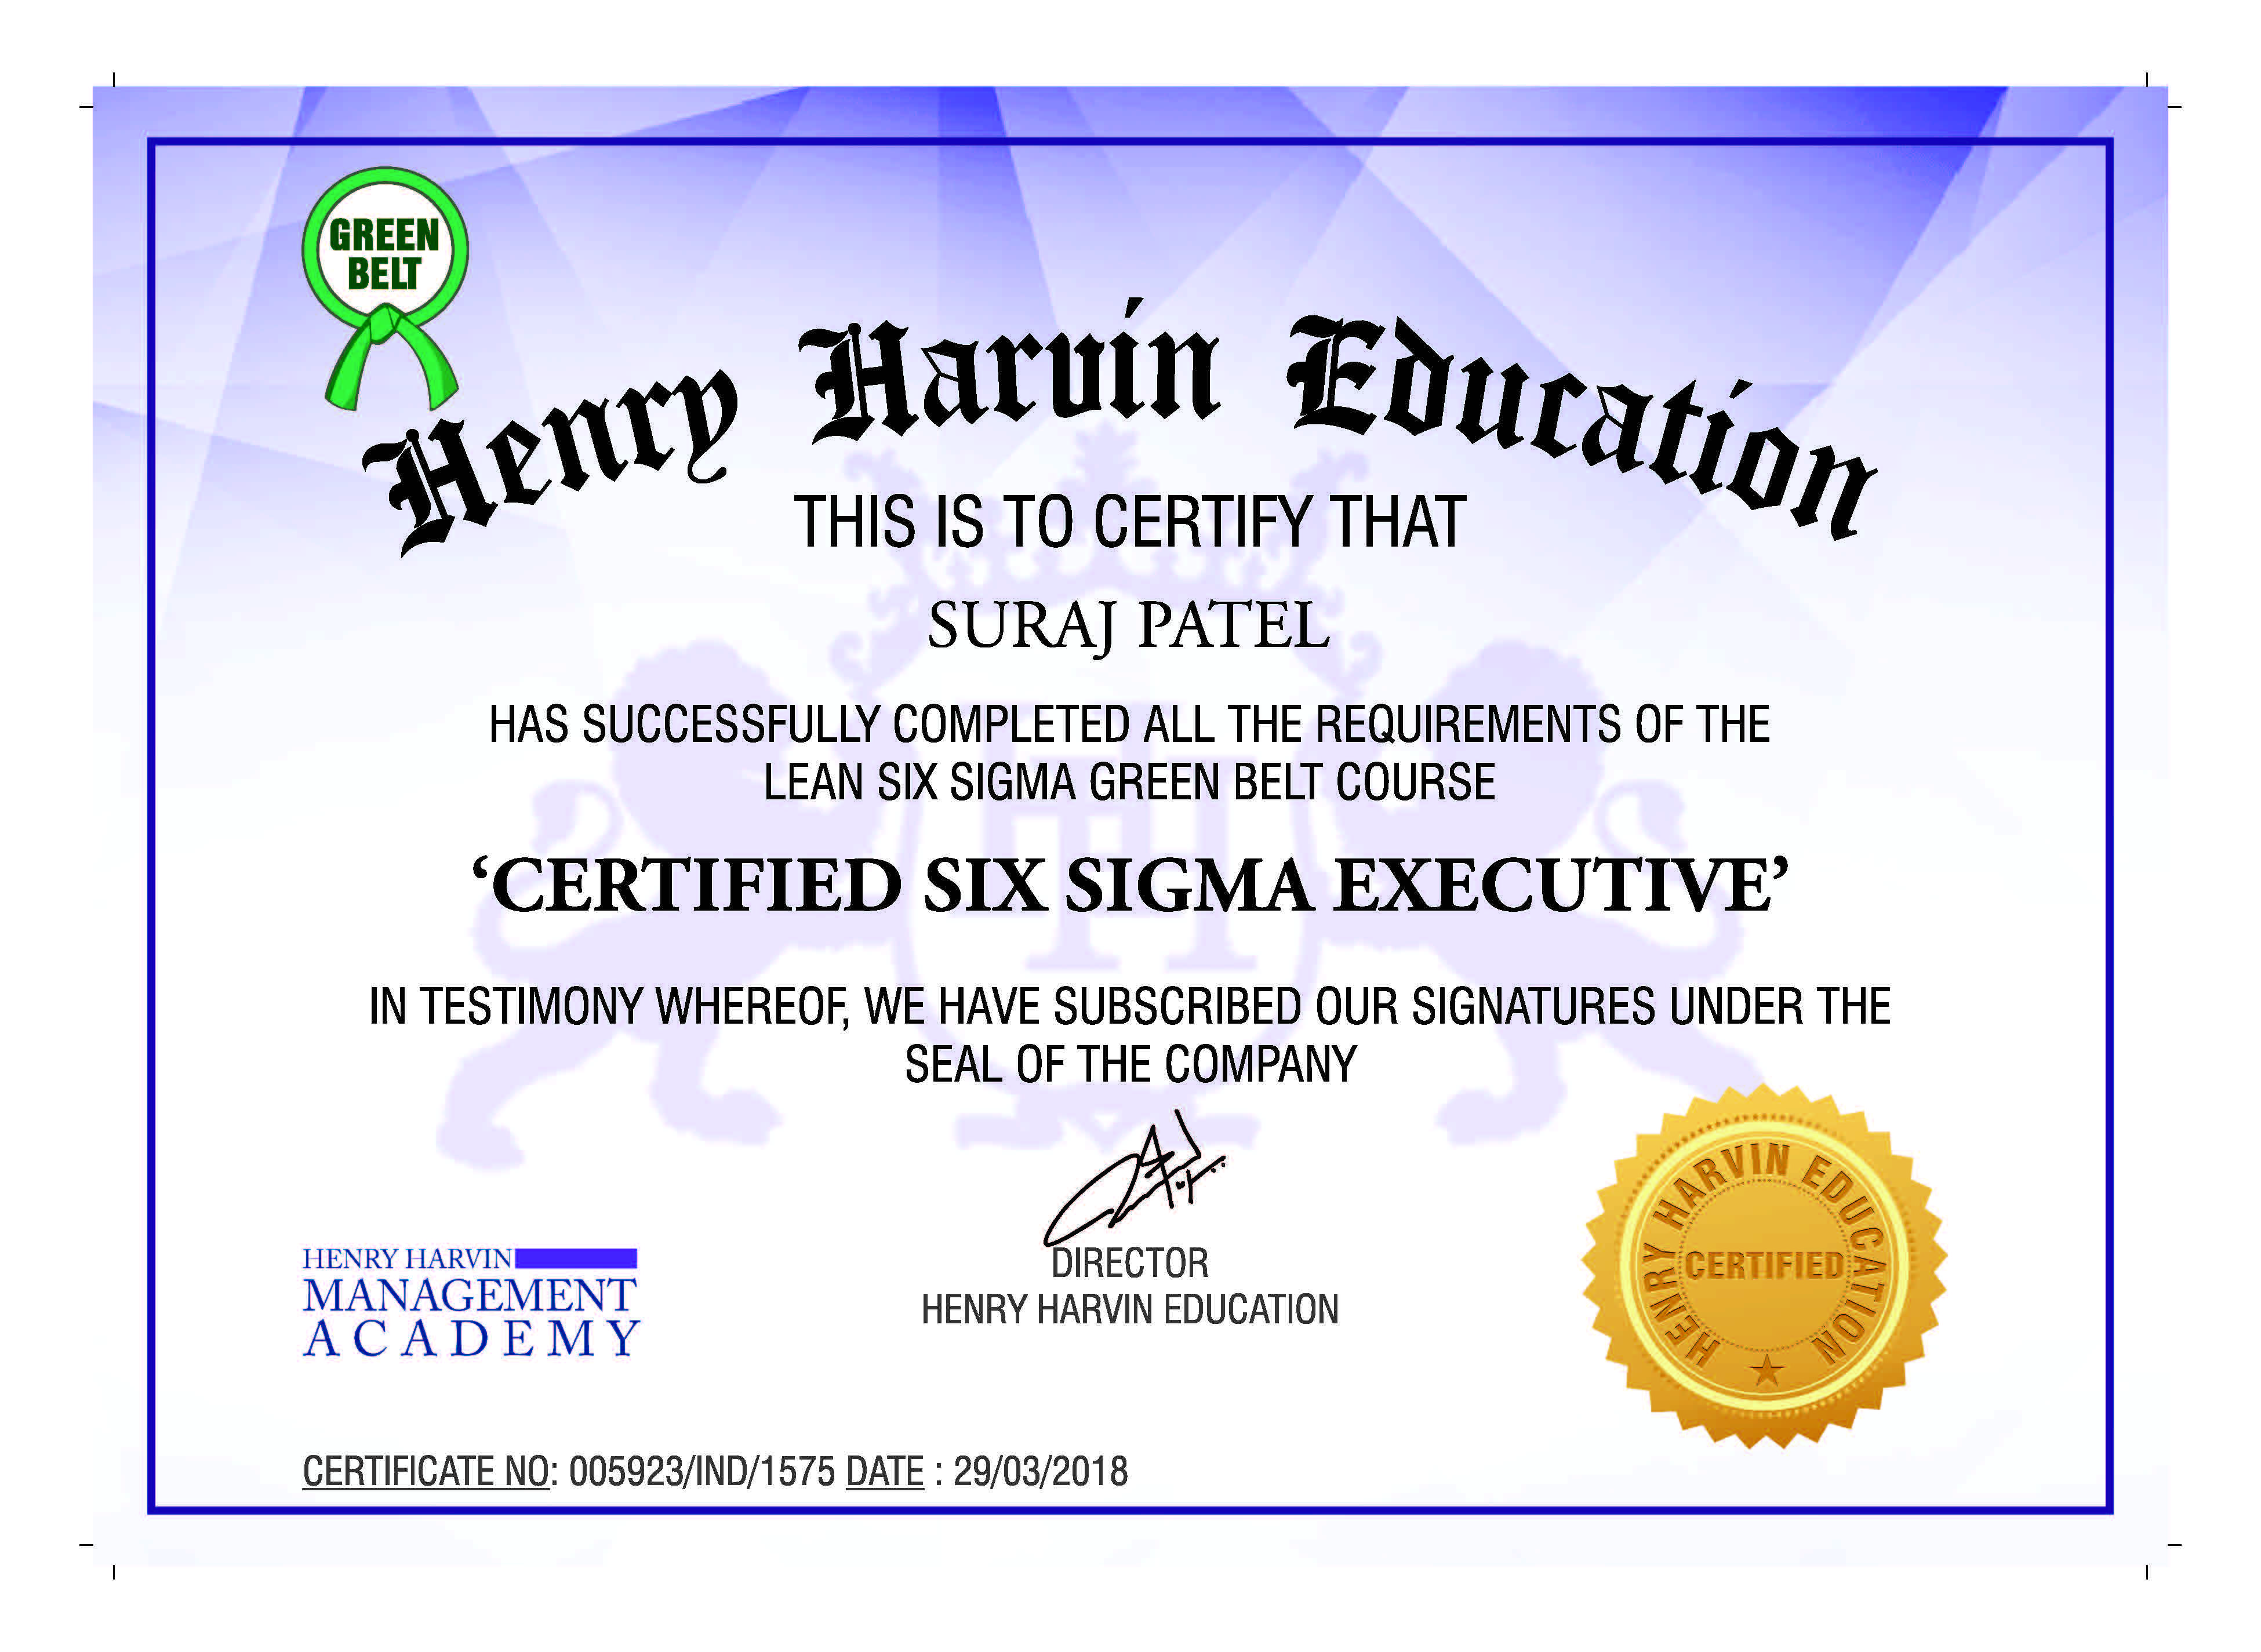 Lean Six Sigma Green Belt Certification By Henry Harvin Education